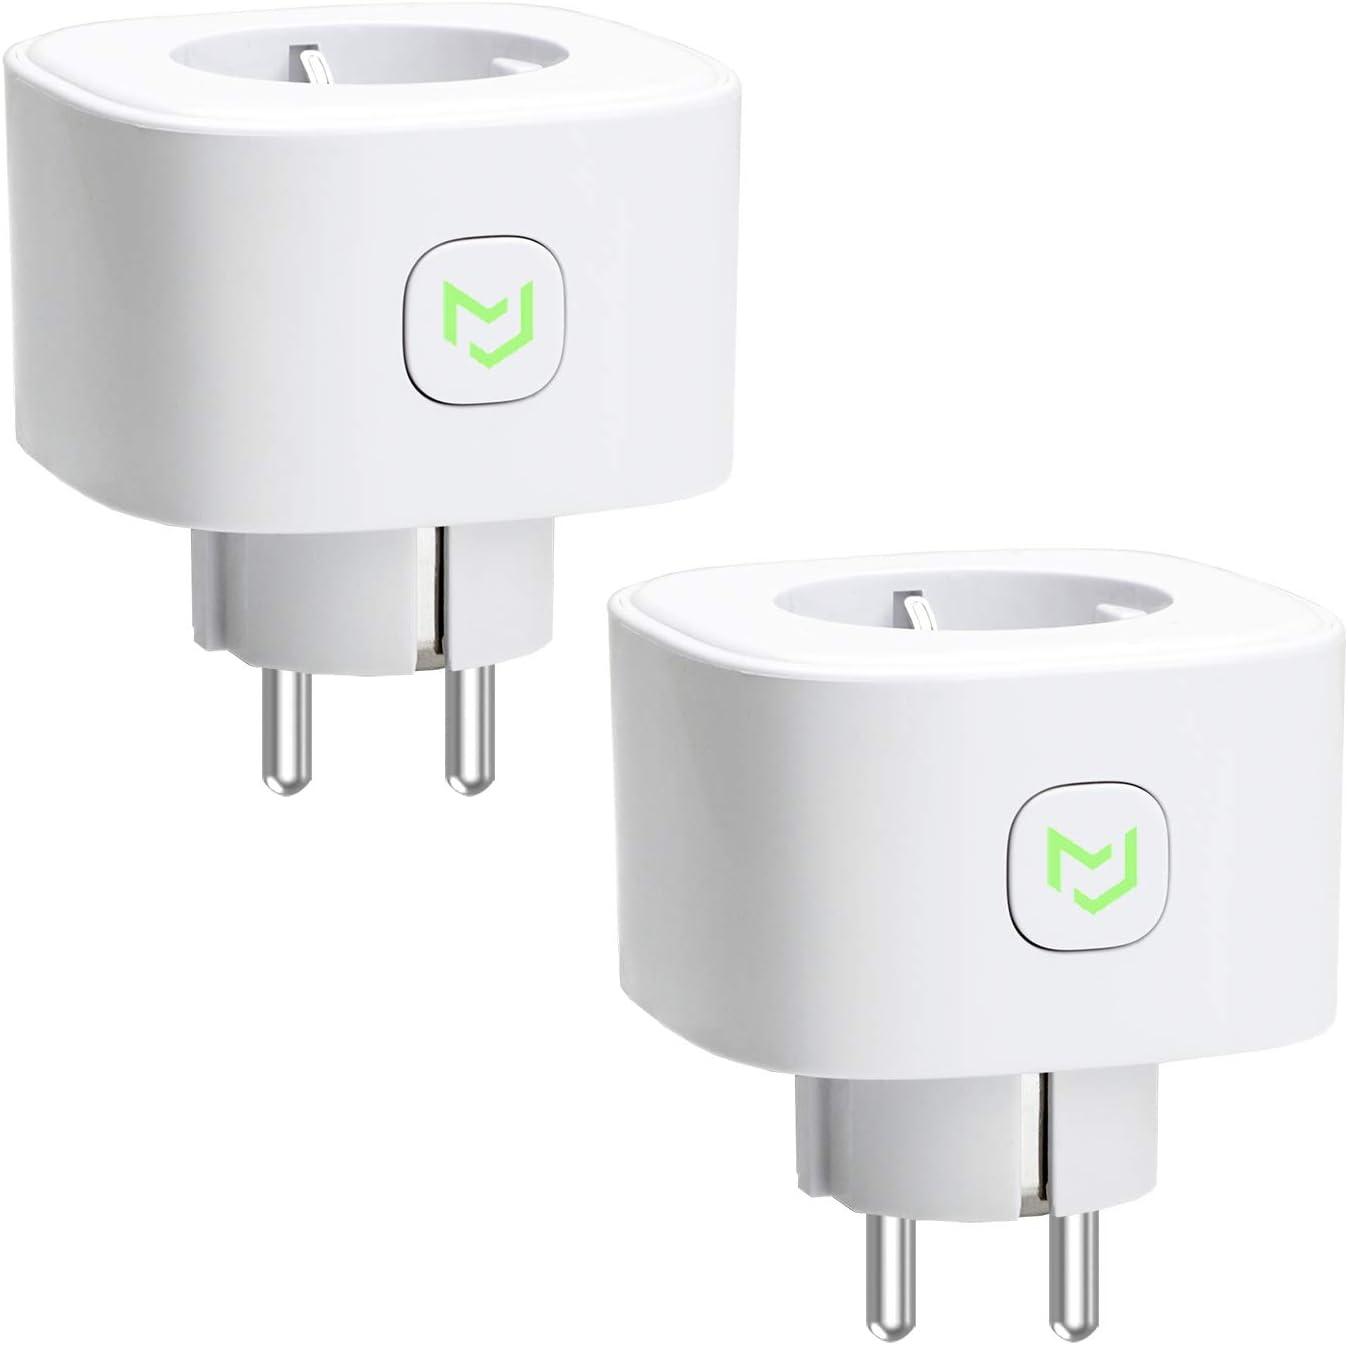 Enchufe Inteligente 16A 3680W, con Control Remoto Meross app. Compatible con Alexa, Google Assistant y SmartThings. Wi-Fi Smart Plug, Modelo MSS210. Paquete de 2